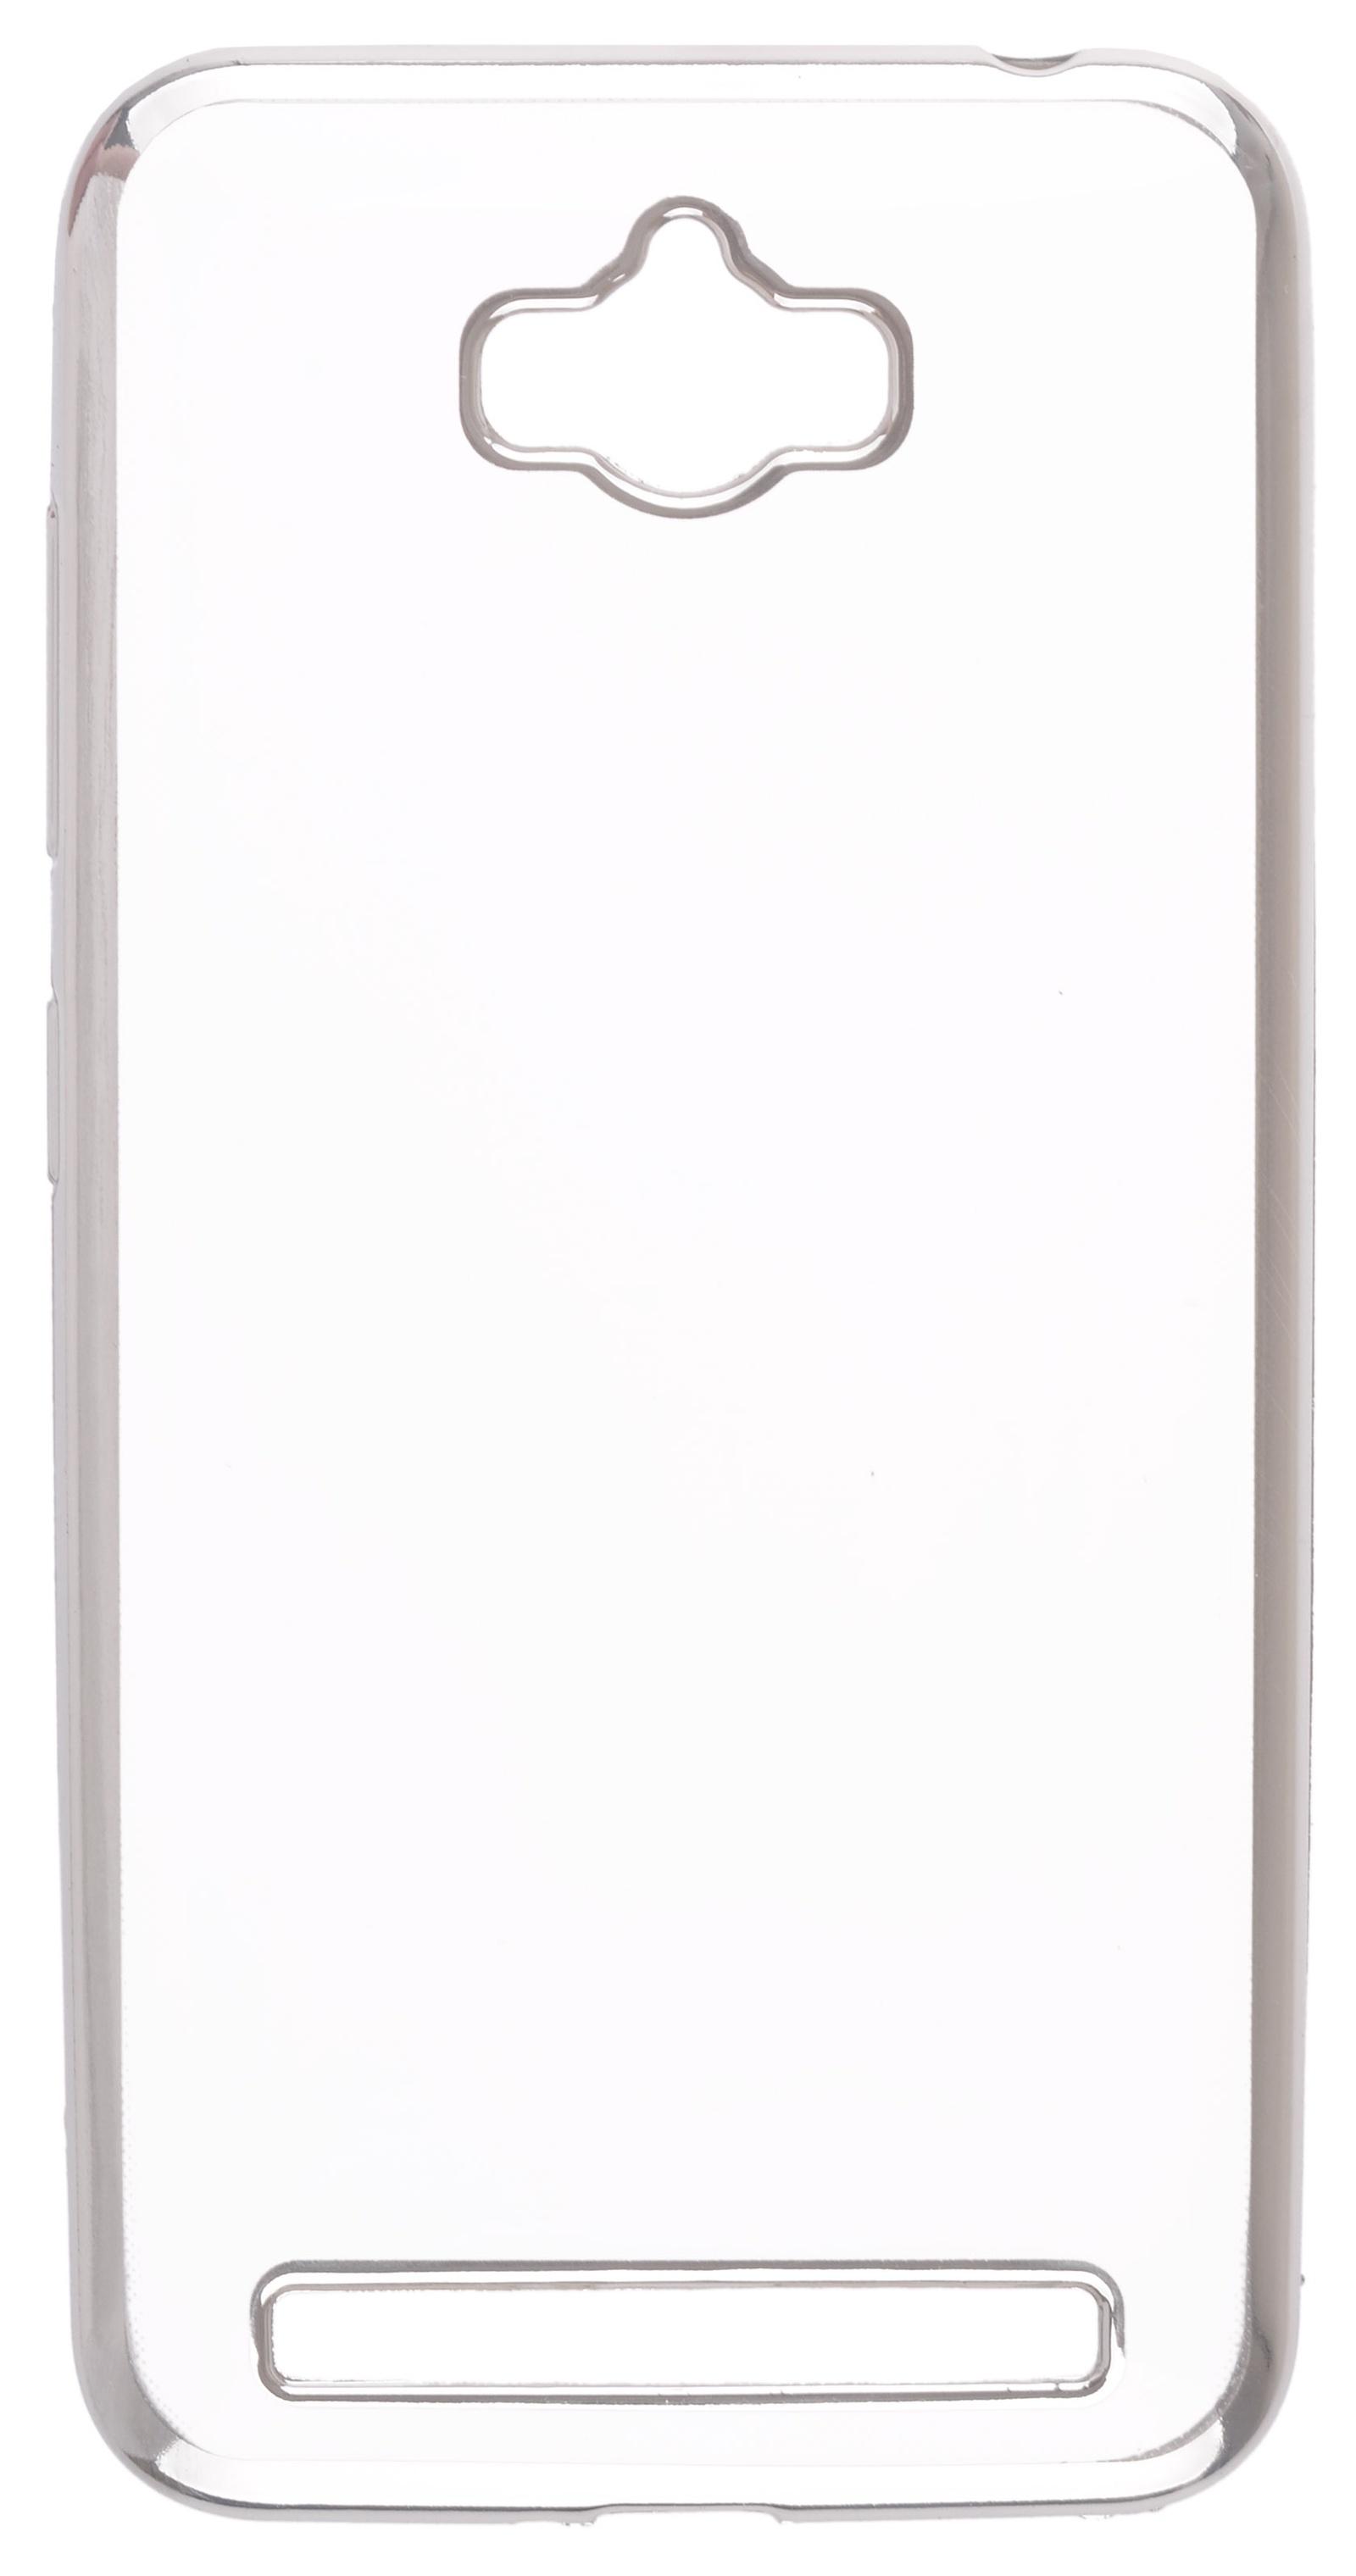 Чехол для сотового телефона skinBOX Silicone chrome border, 4660041407969, серебристый чехол для сотового телефона skinbox silicone chrome border 4630042528697 серебристый